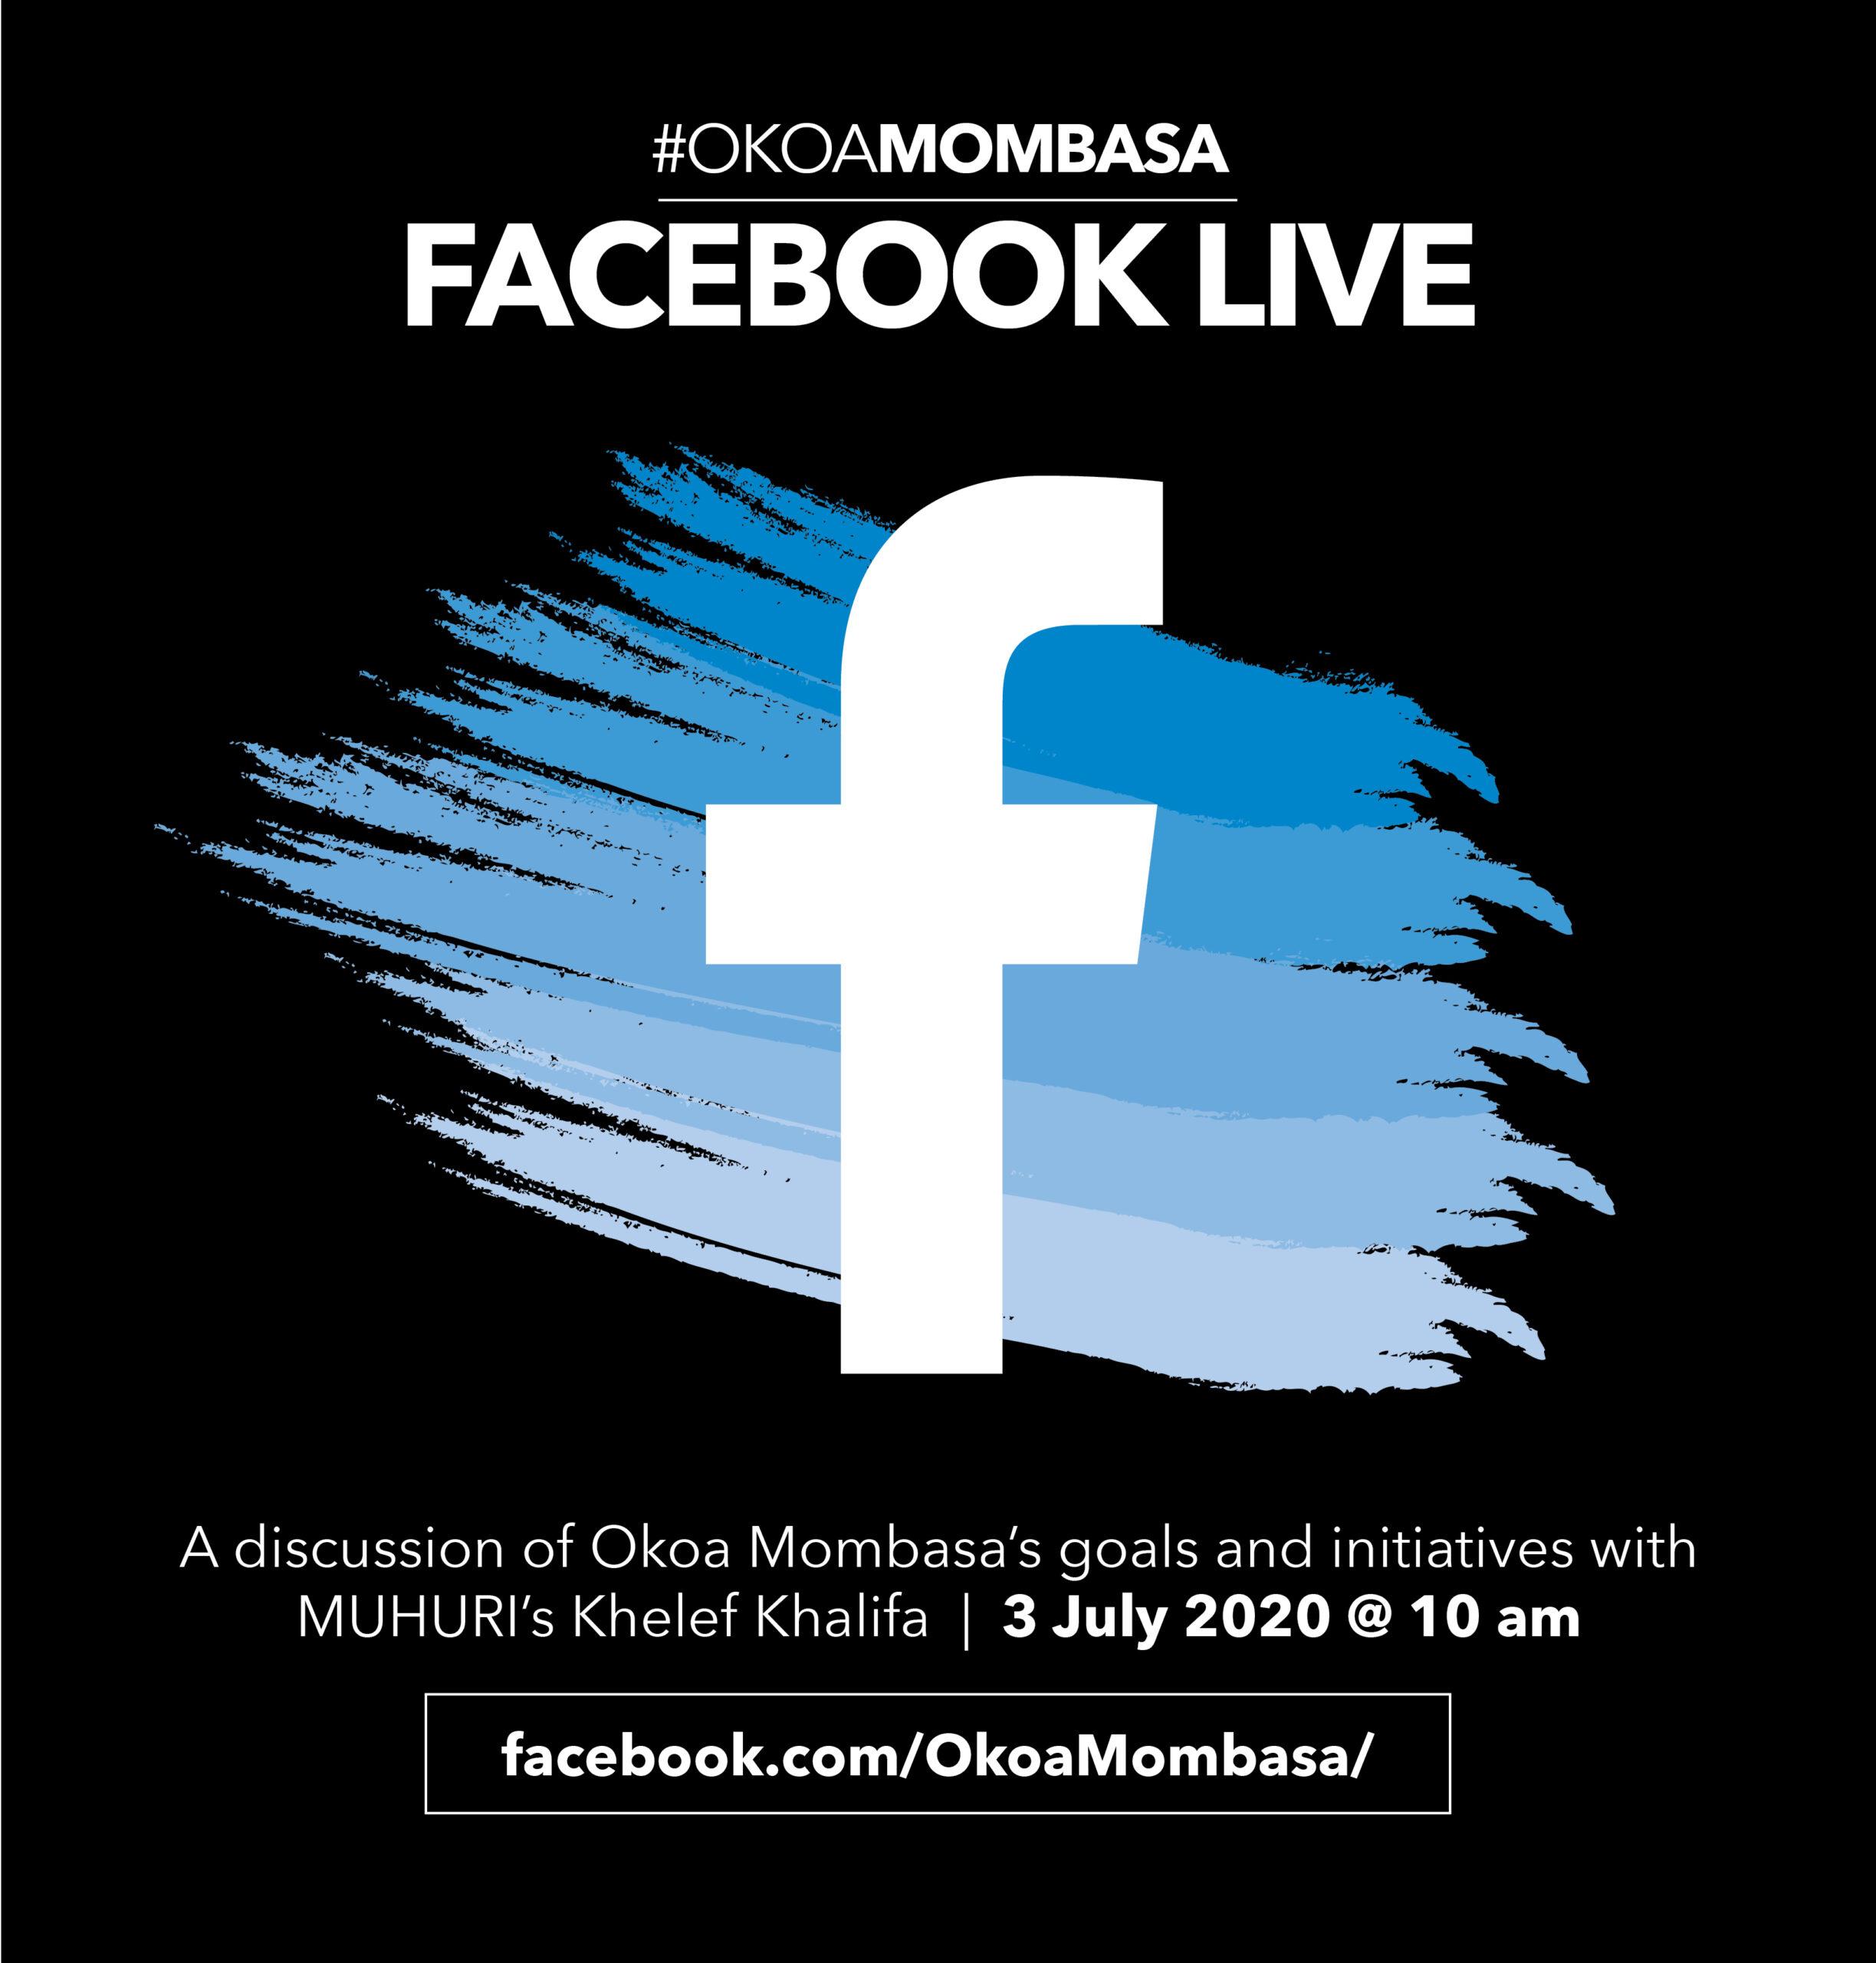 Okoa Mombasa Facebook Live: Featuring Khelef Khalifa on 3 July 2020